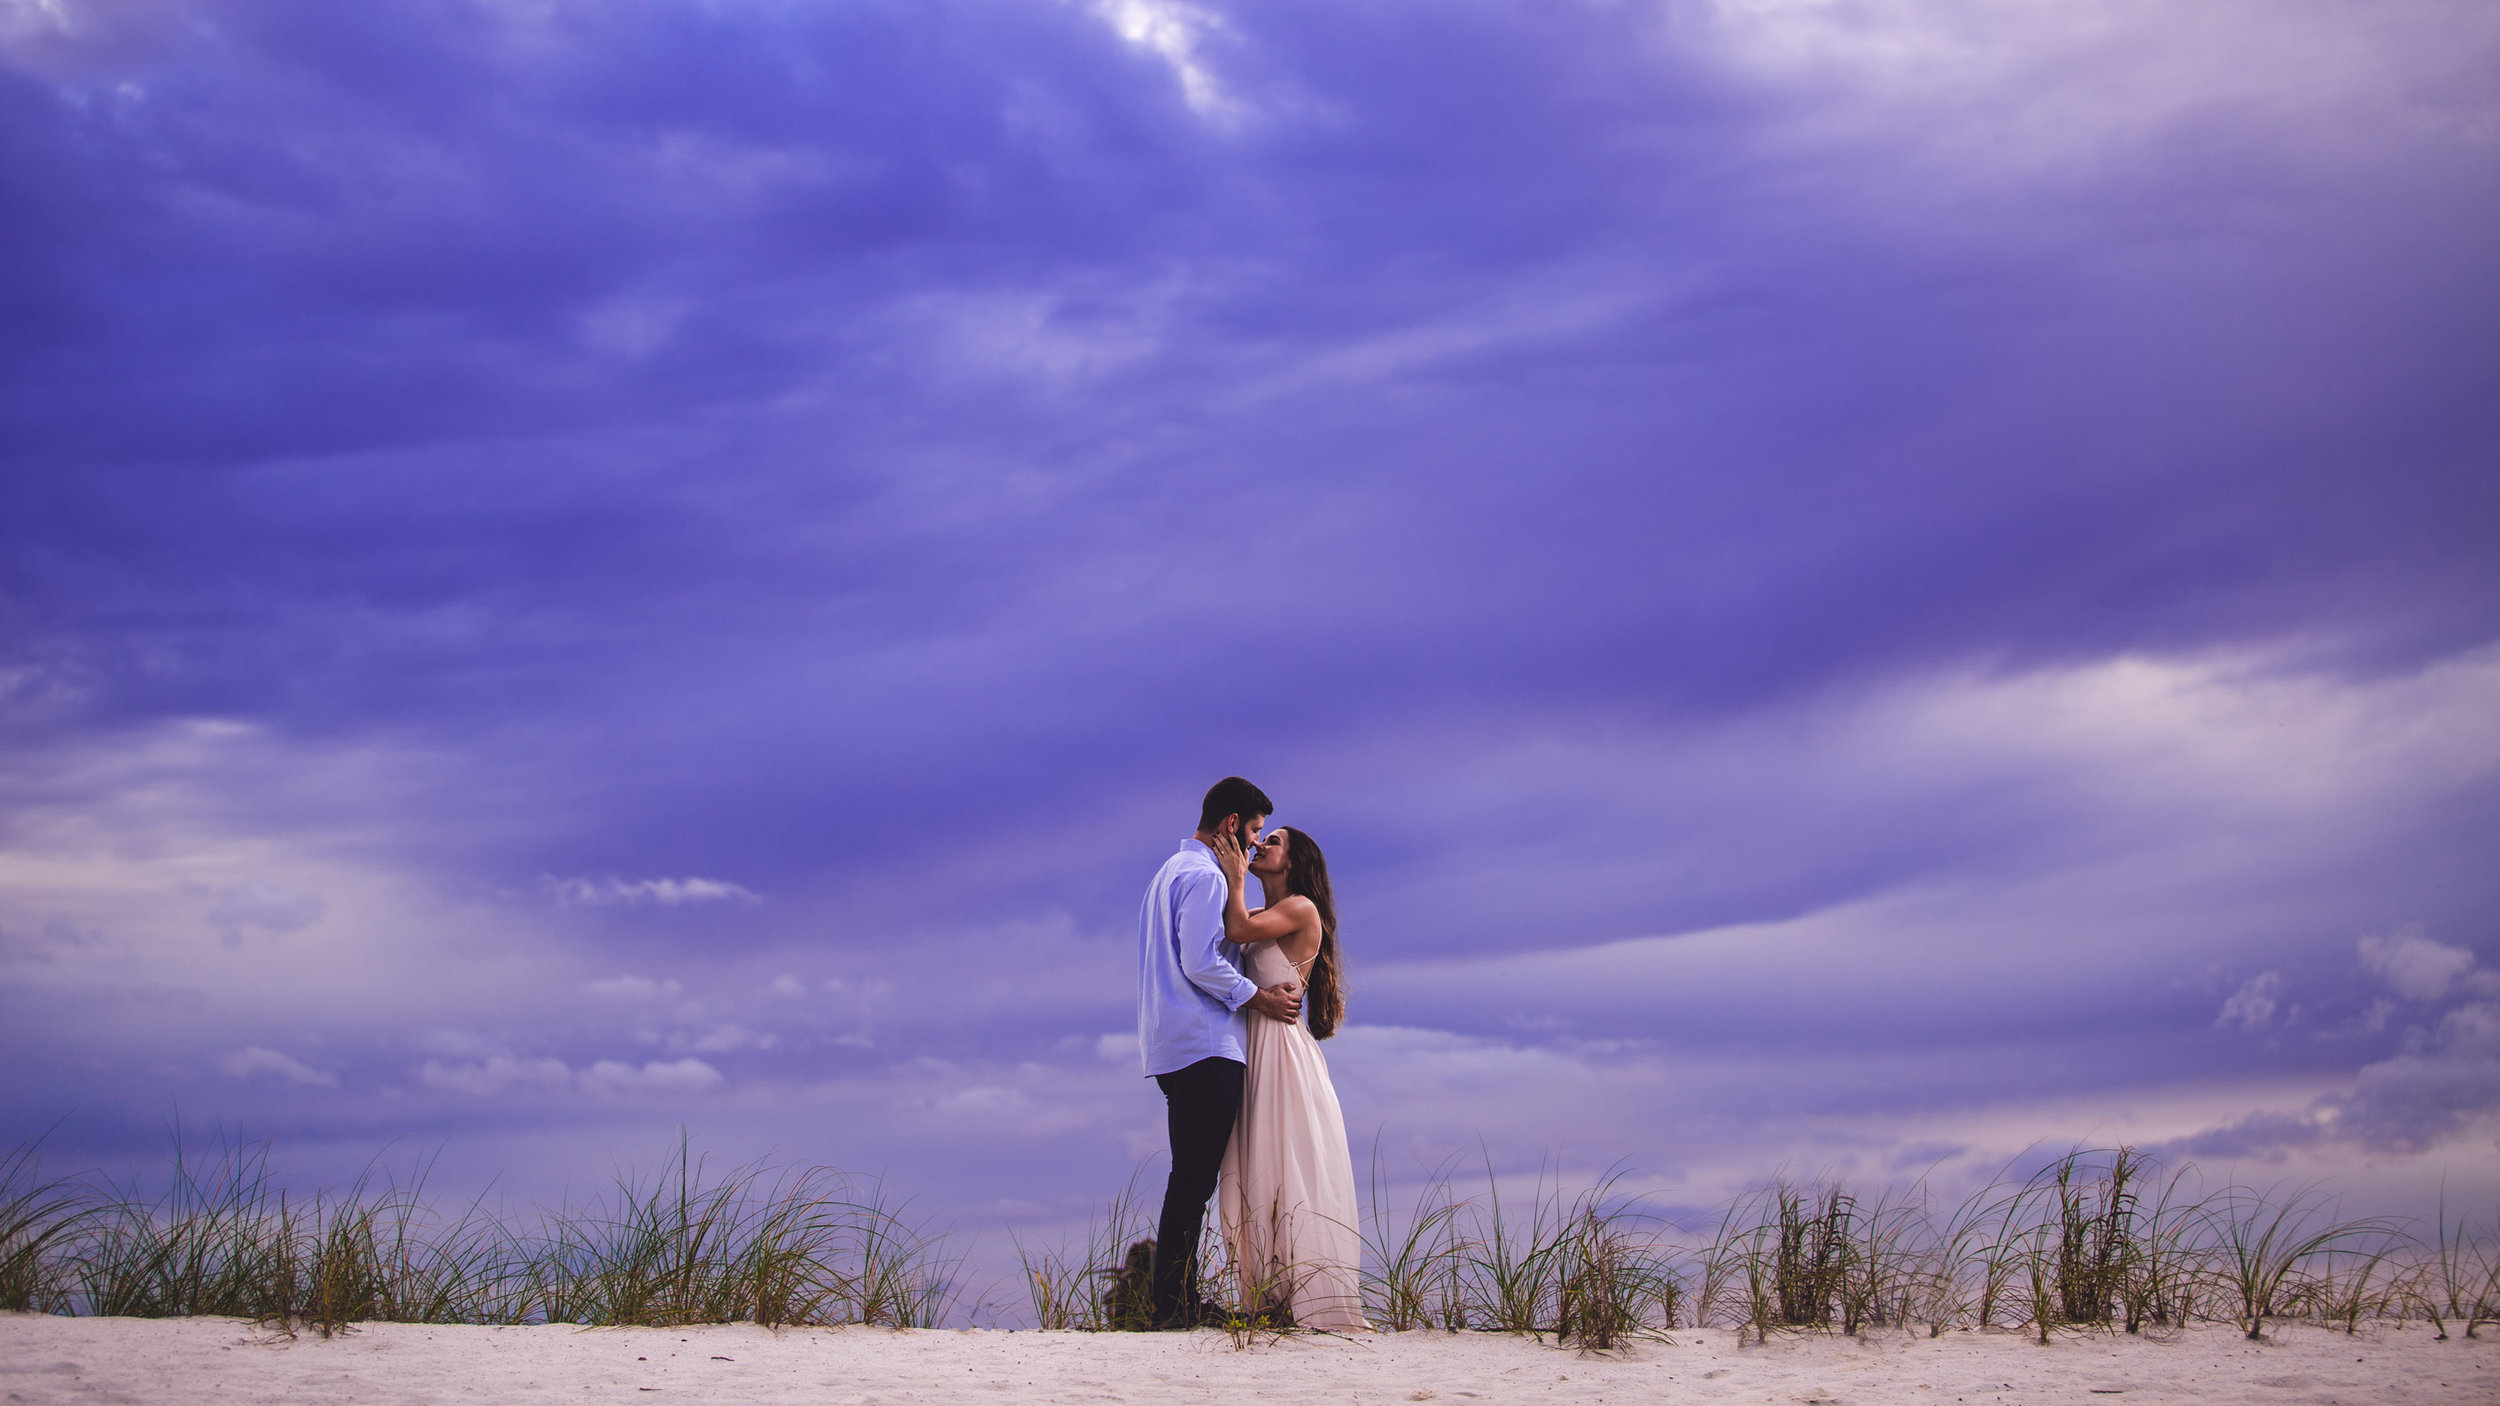 adam-szarmack-jacksonville-wedding-photographer-palm-coast-washing-oaks-garden-state-park-engagement-42.jpg